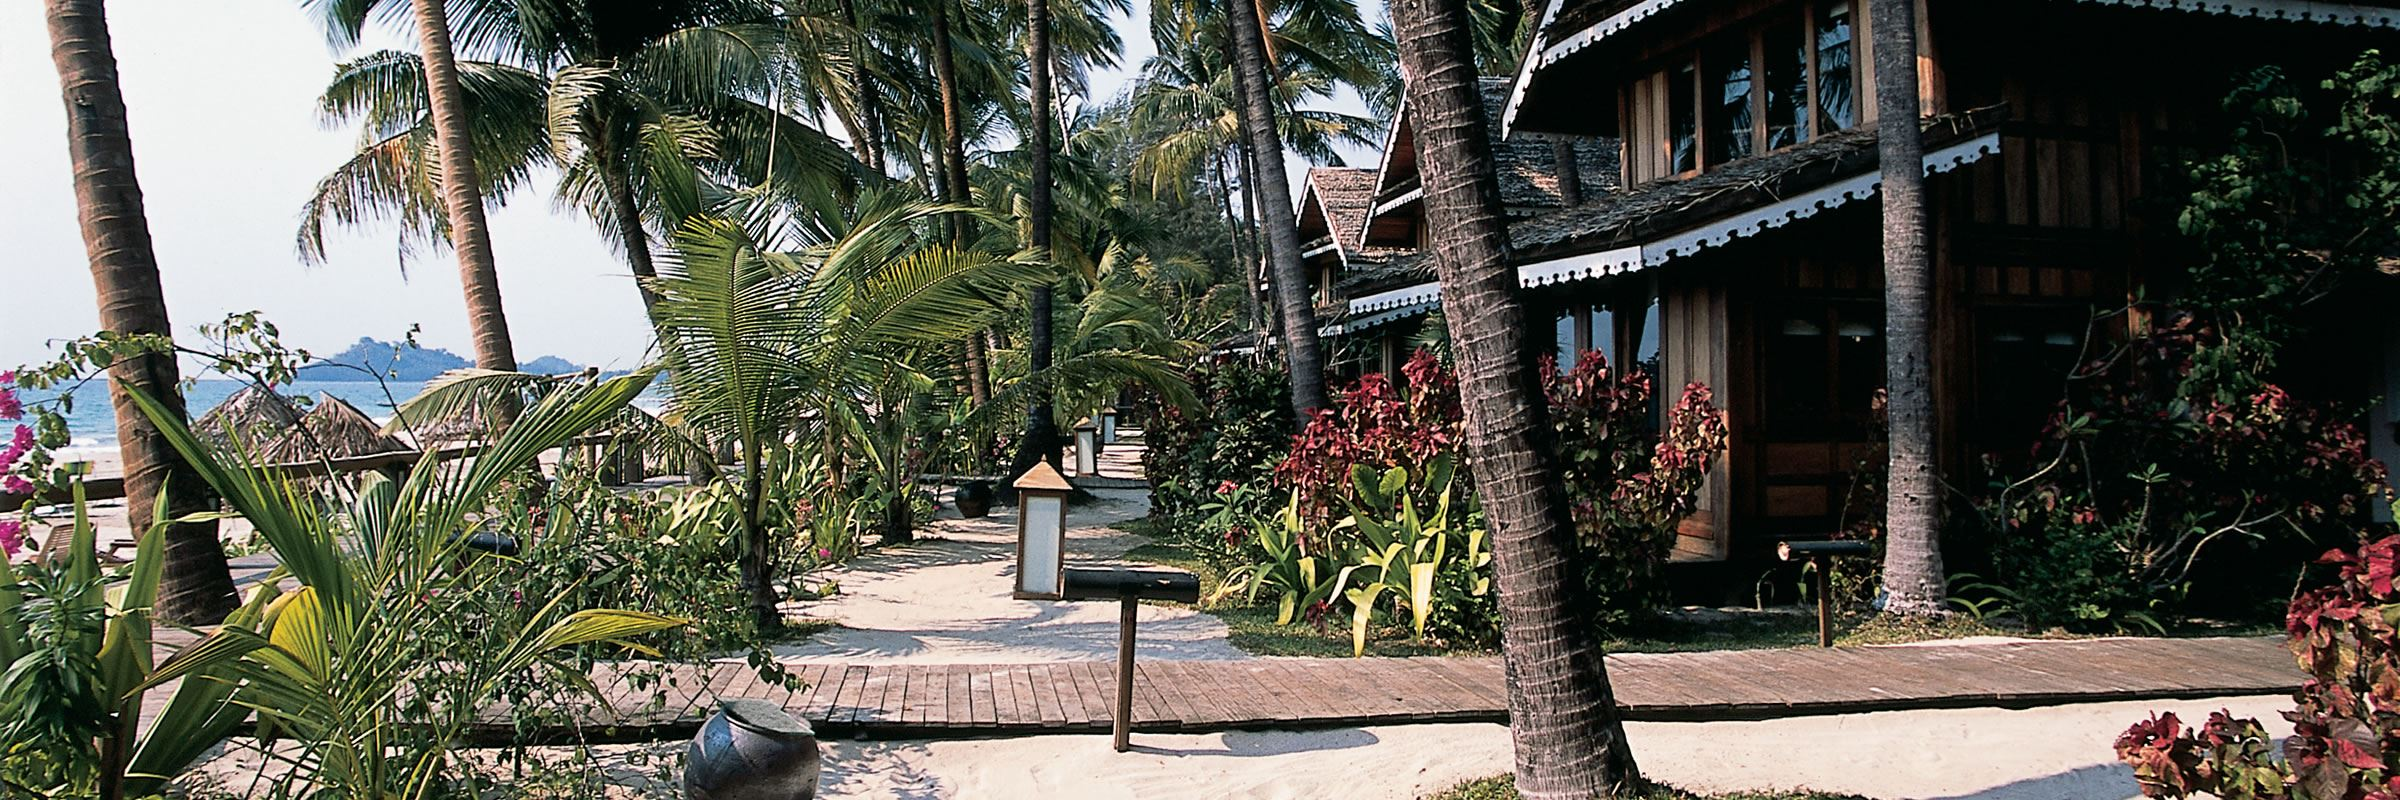 sandoway resort hotels in ngapali beach audley travel rh audleytravel com